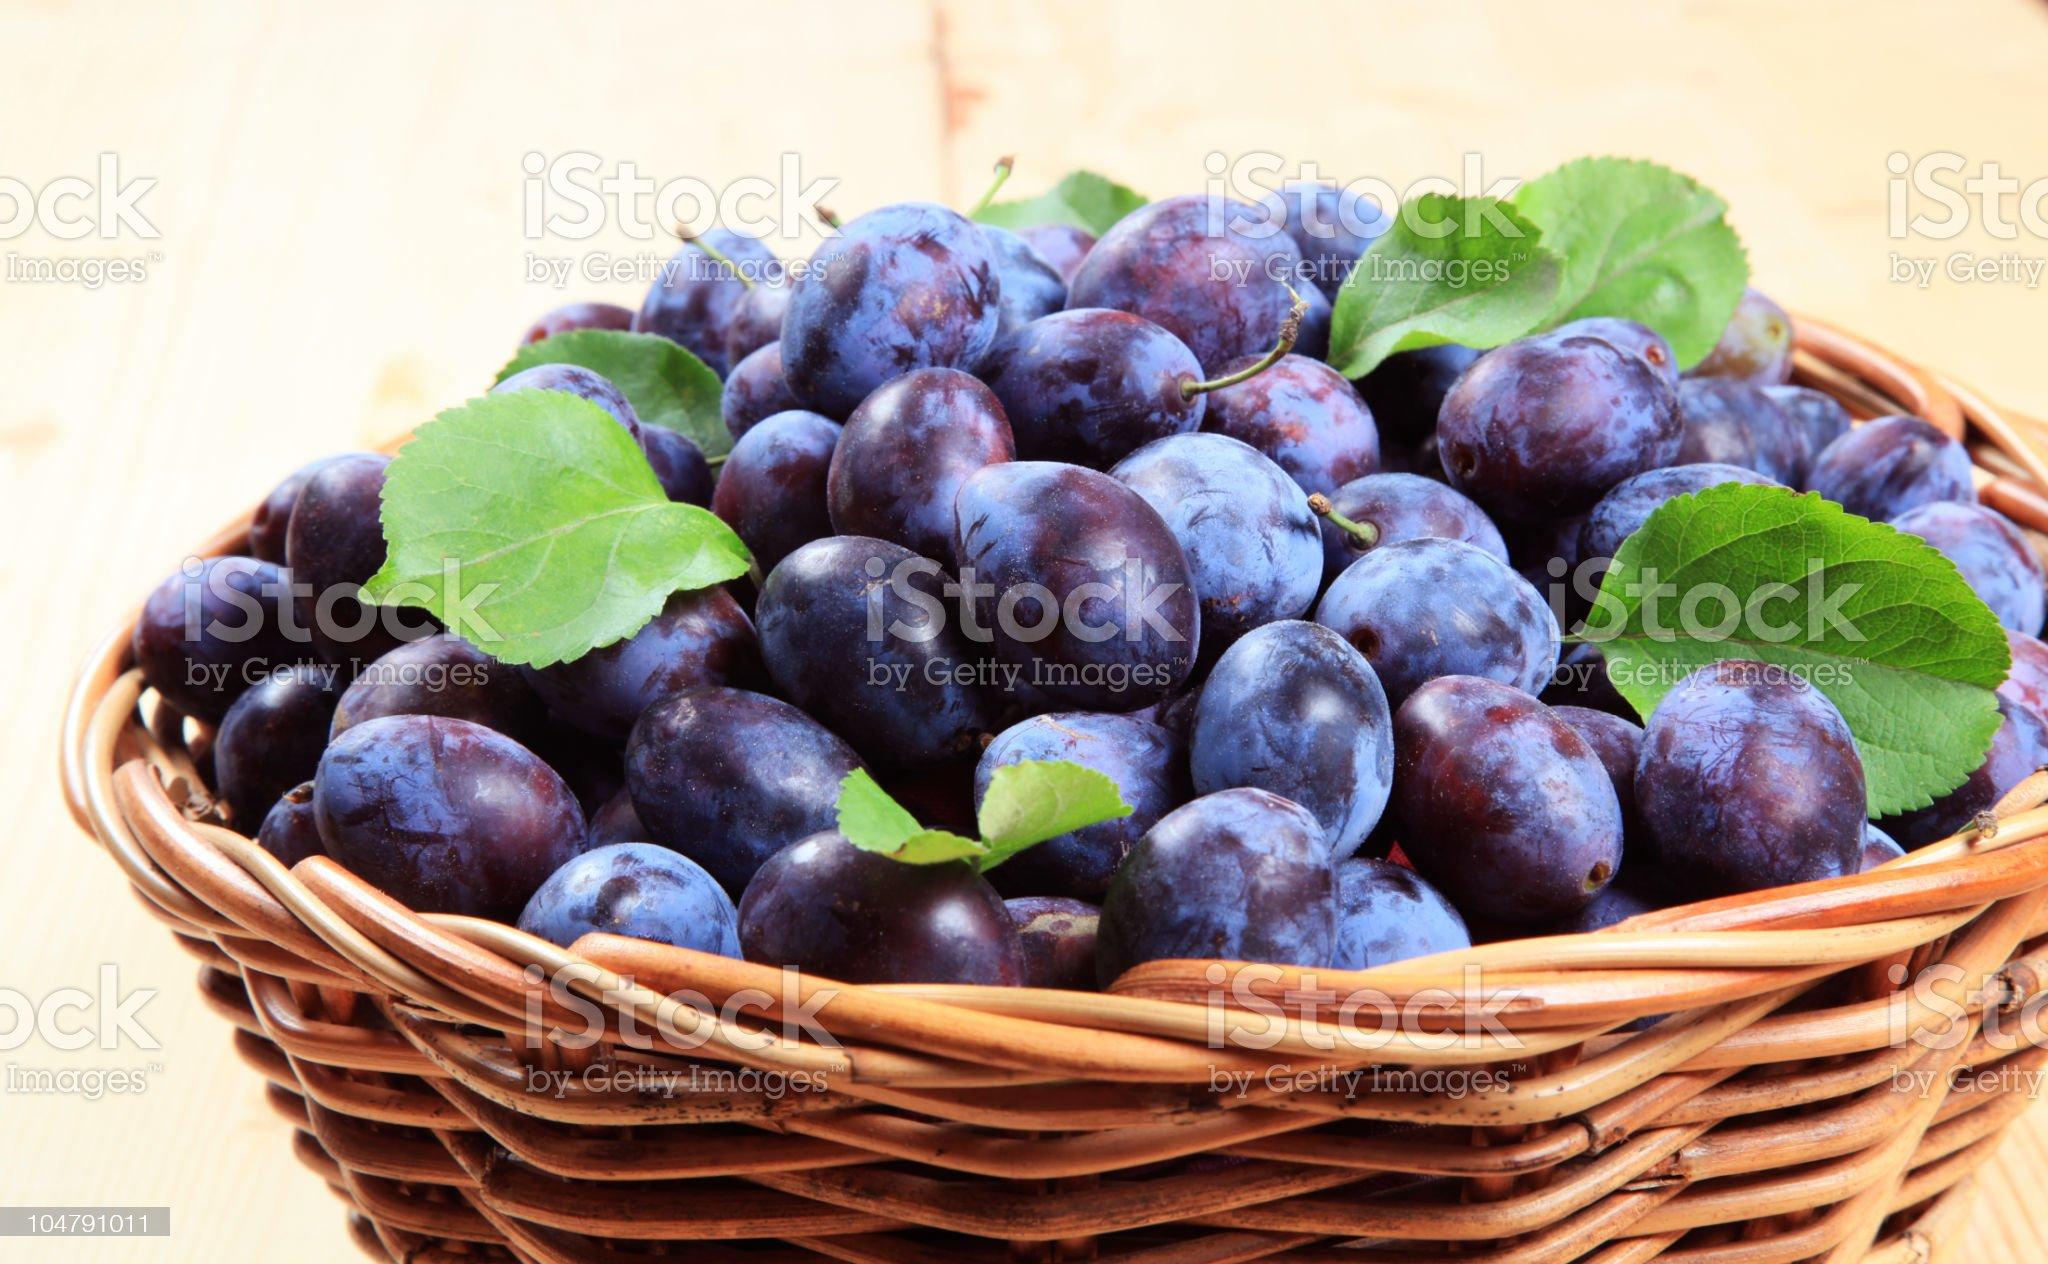 Damson plums royalty-free stock photo